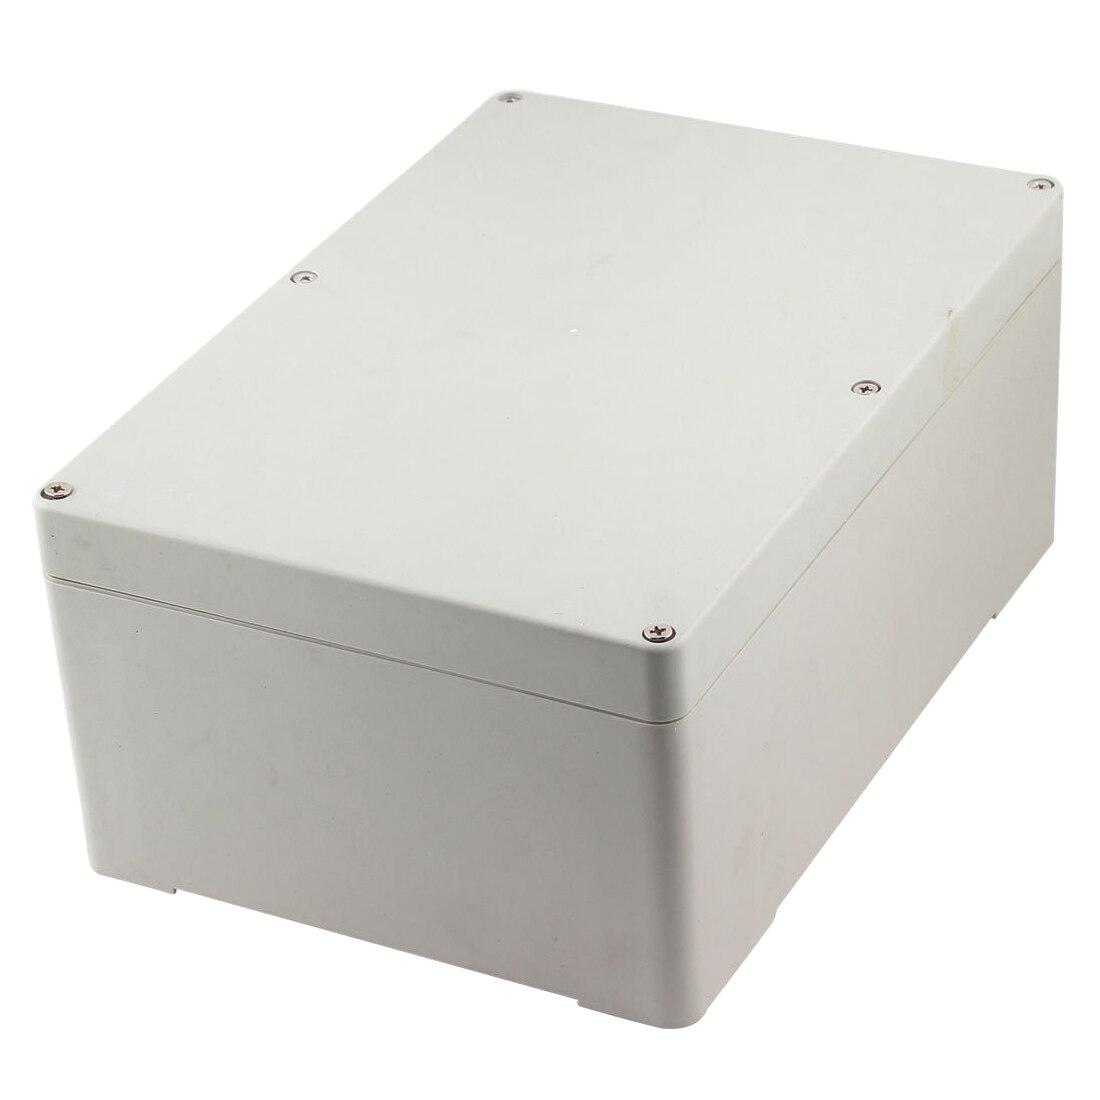 Waterproof Plastic Enclosure Case Junction Box 265mm x 185mm x 115mm waterproof enclosure junction box 2in2out